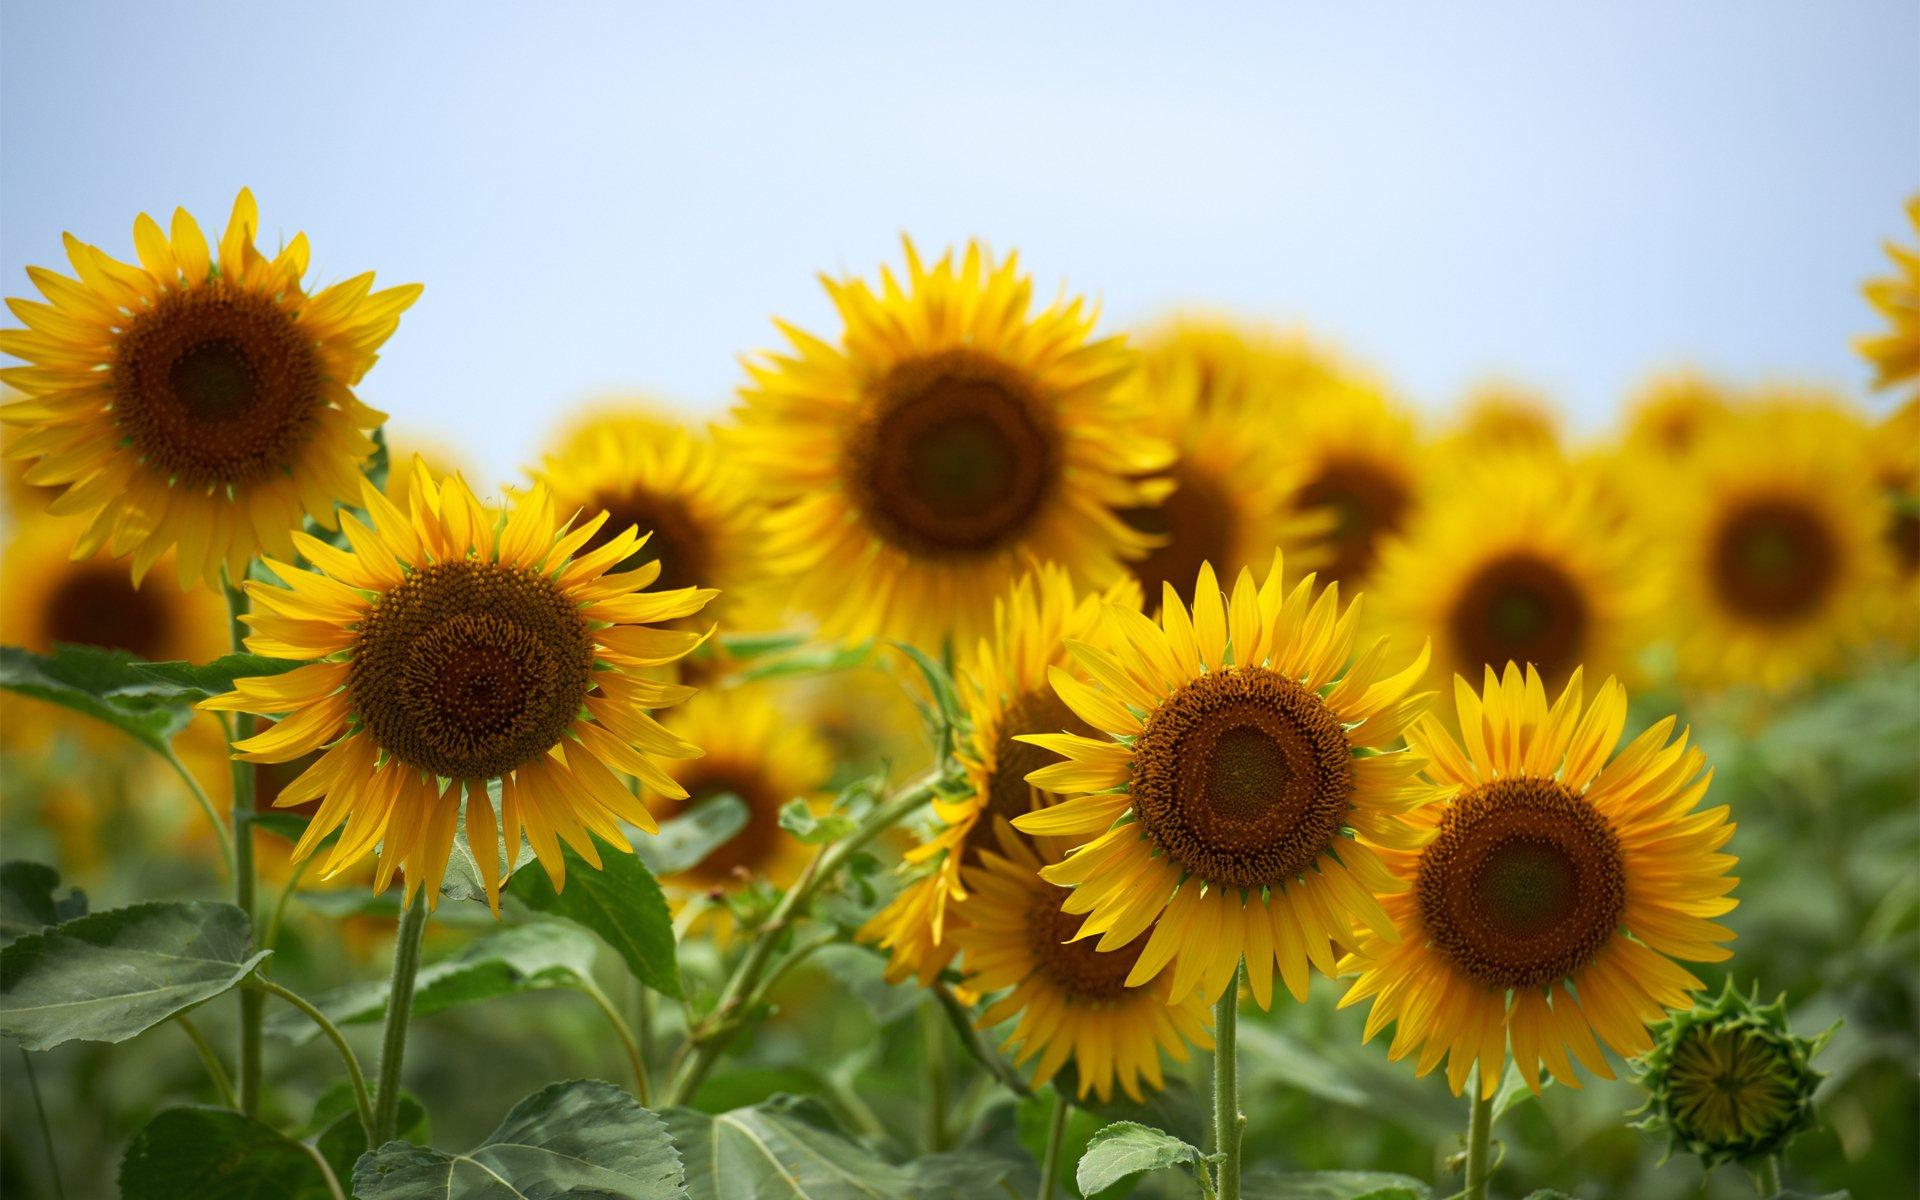 Imagenes De Fondo Flores Para Pantalla Hd 2: Sunflower HD Wallpaper